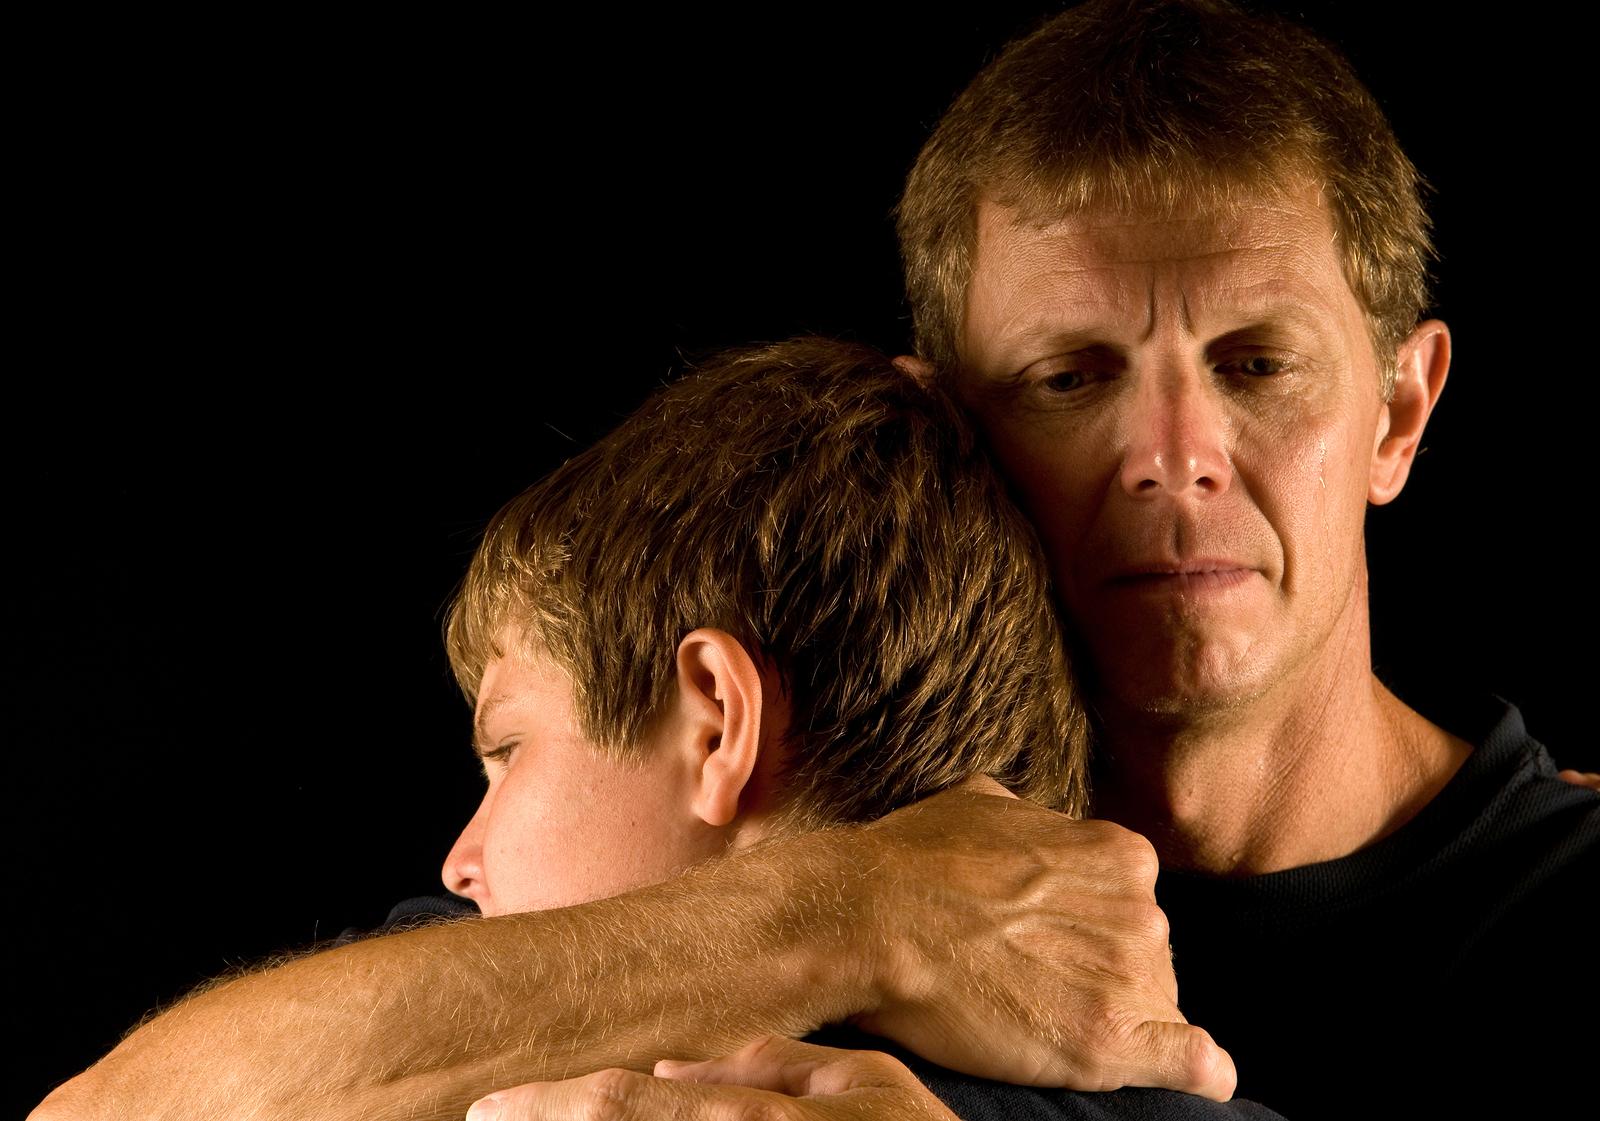 bigstock-Father-hugs-son-5655891.jpg